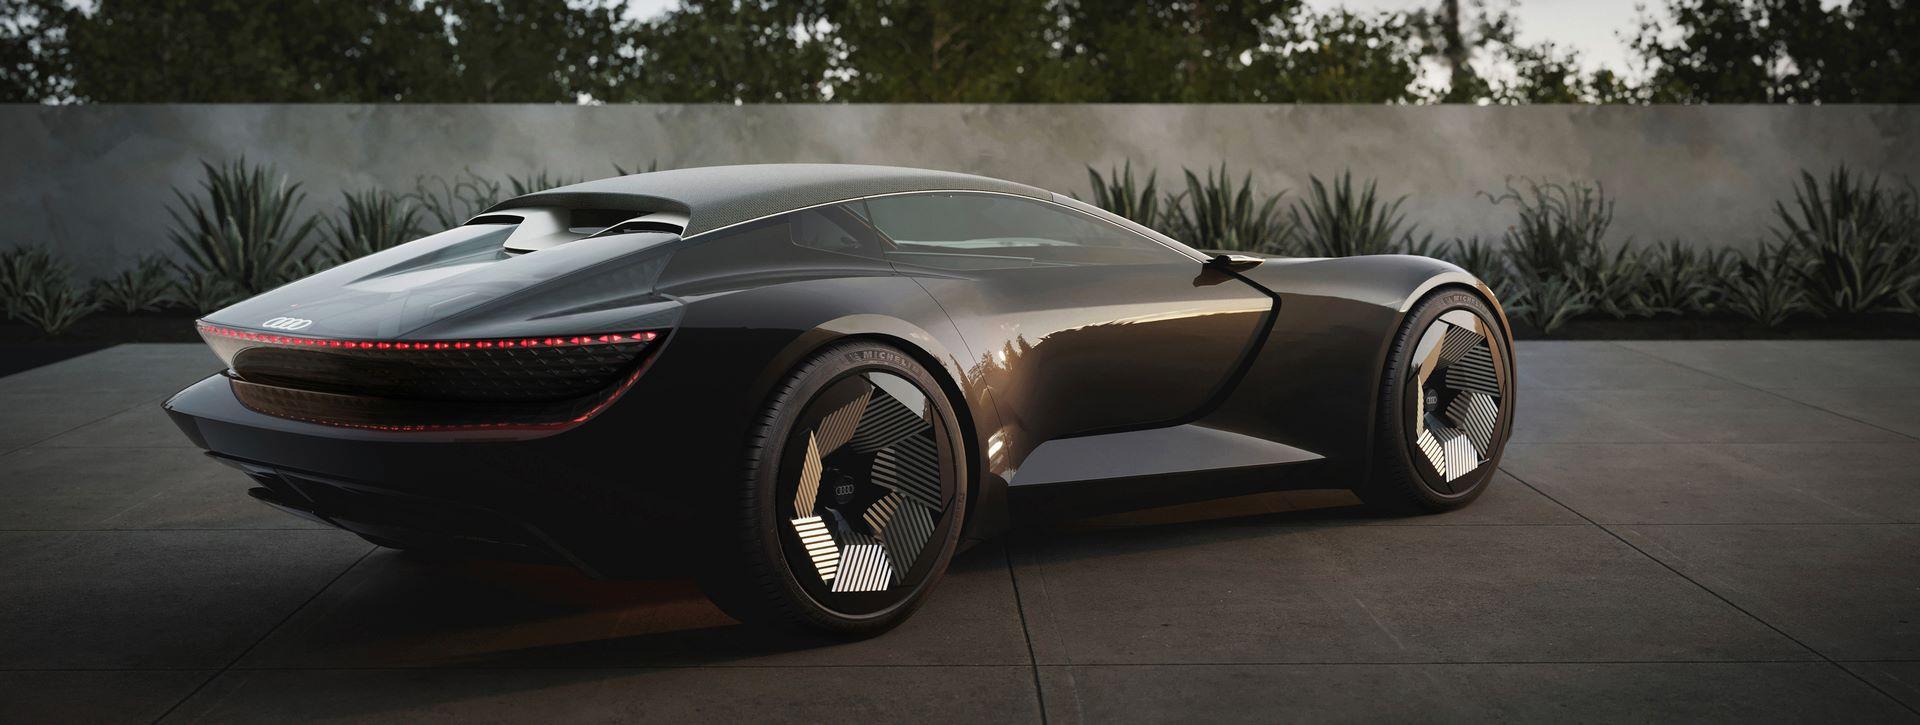 Audi-Skysphere-Concept-25